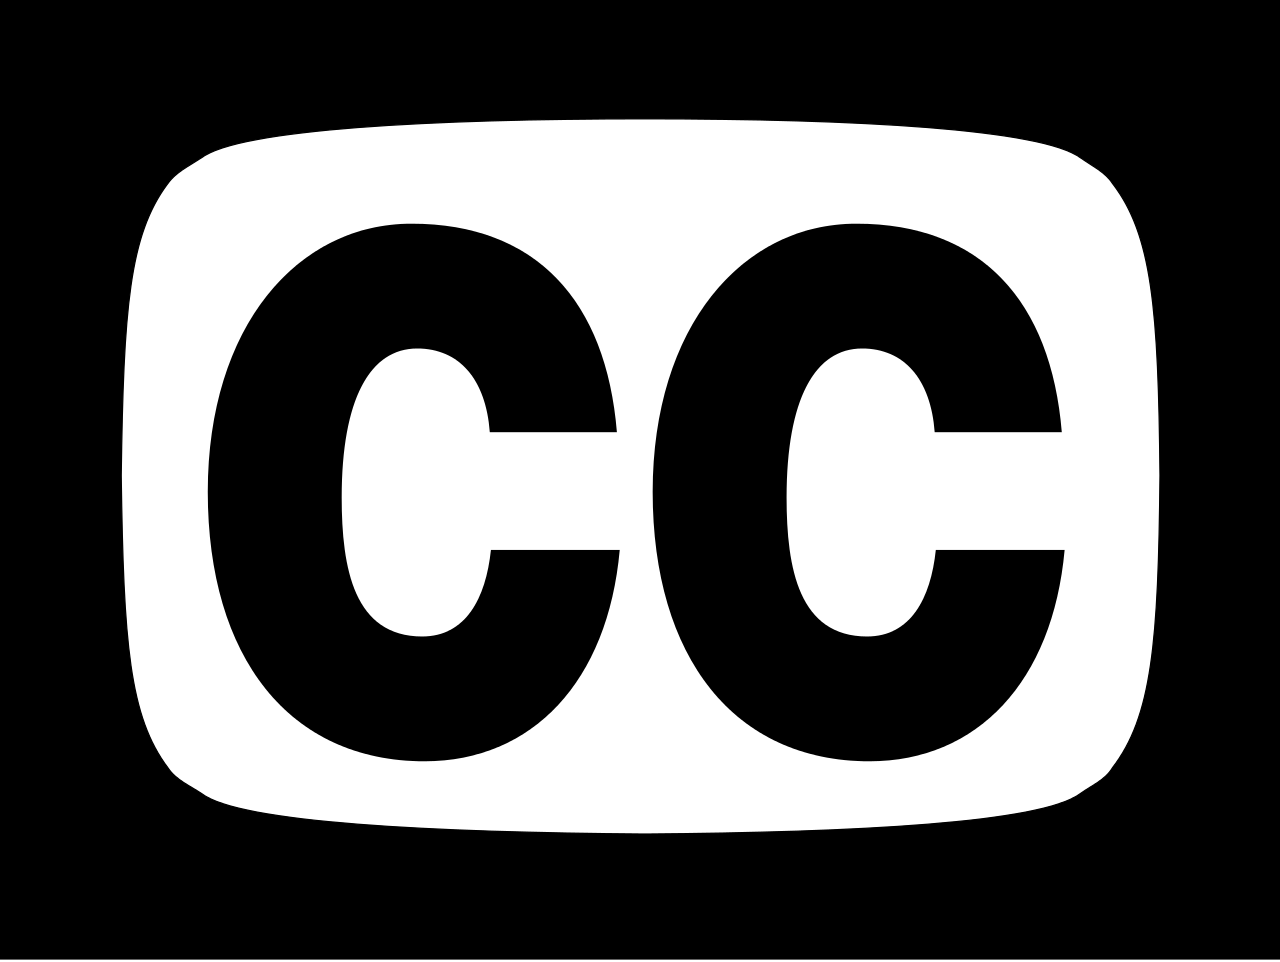 File:Closed captioning symbol.svg.